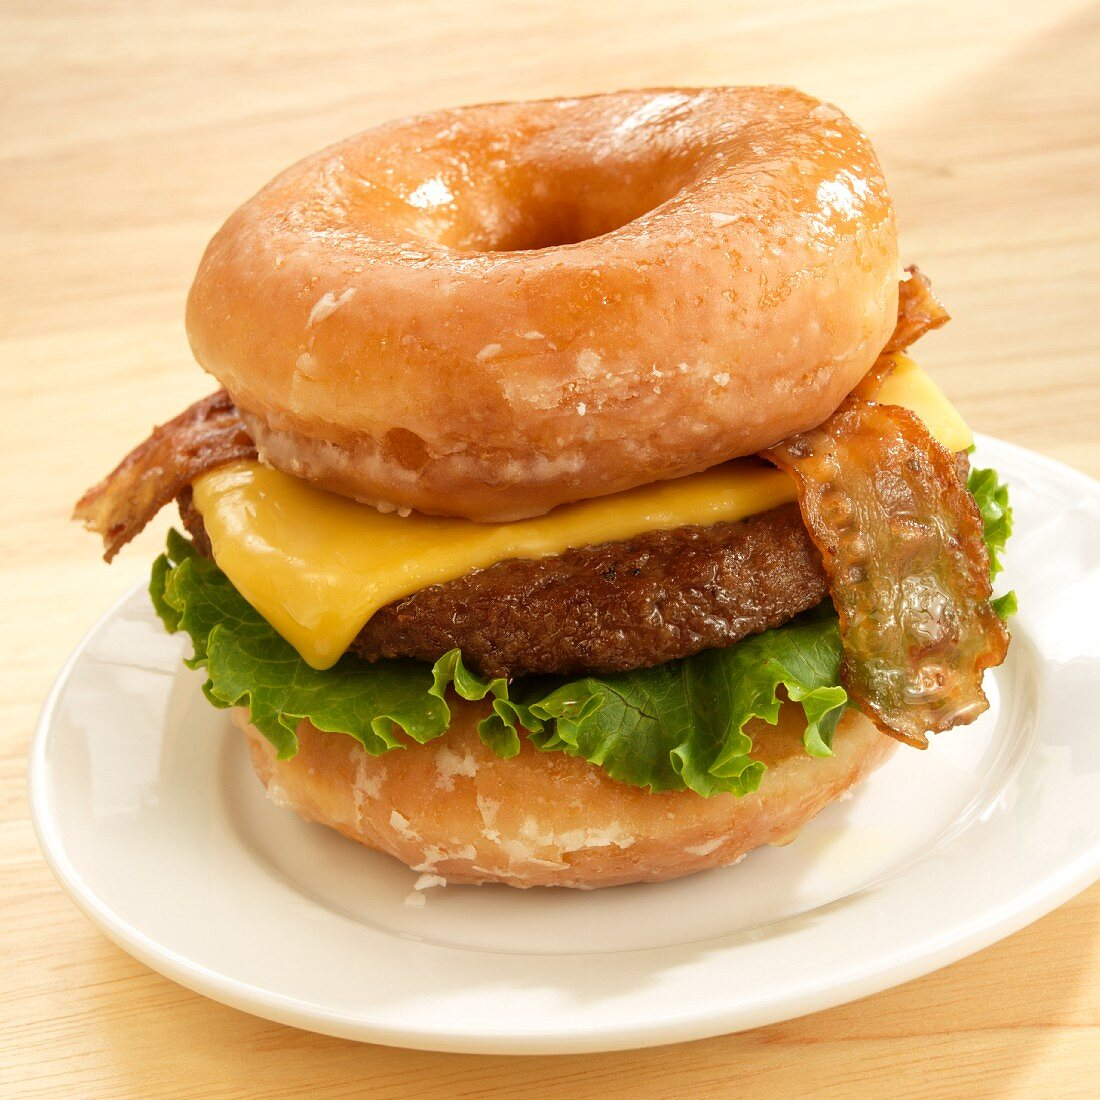 Bacon Cheeseburger Served on Two Krispie Kreme Donuts